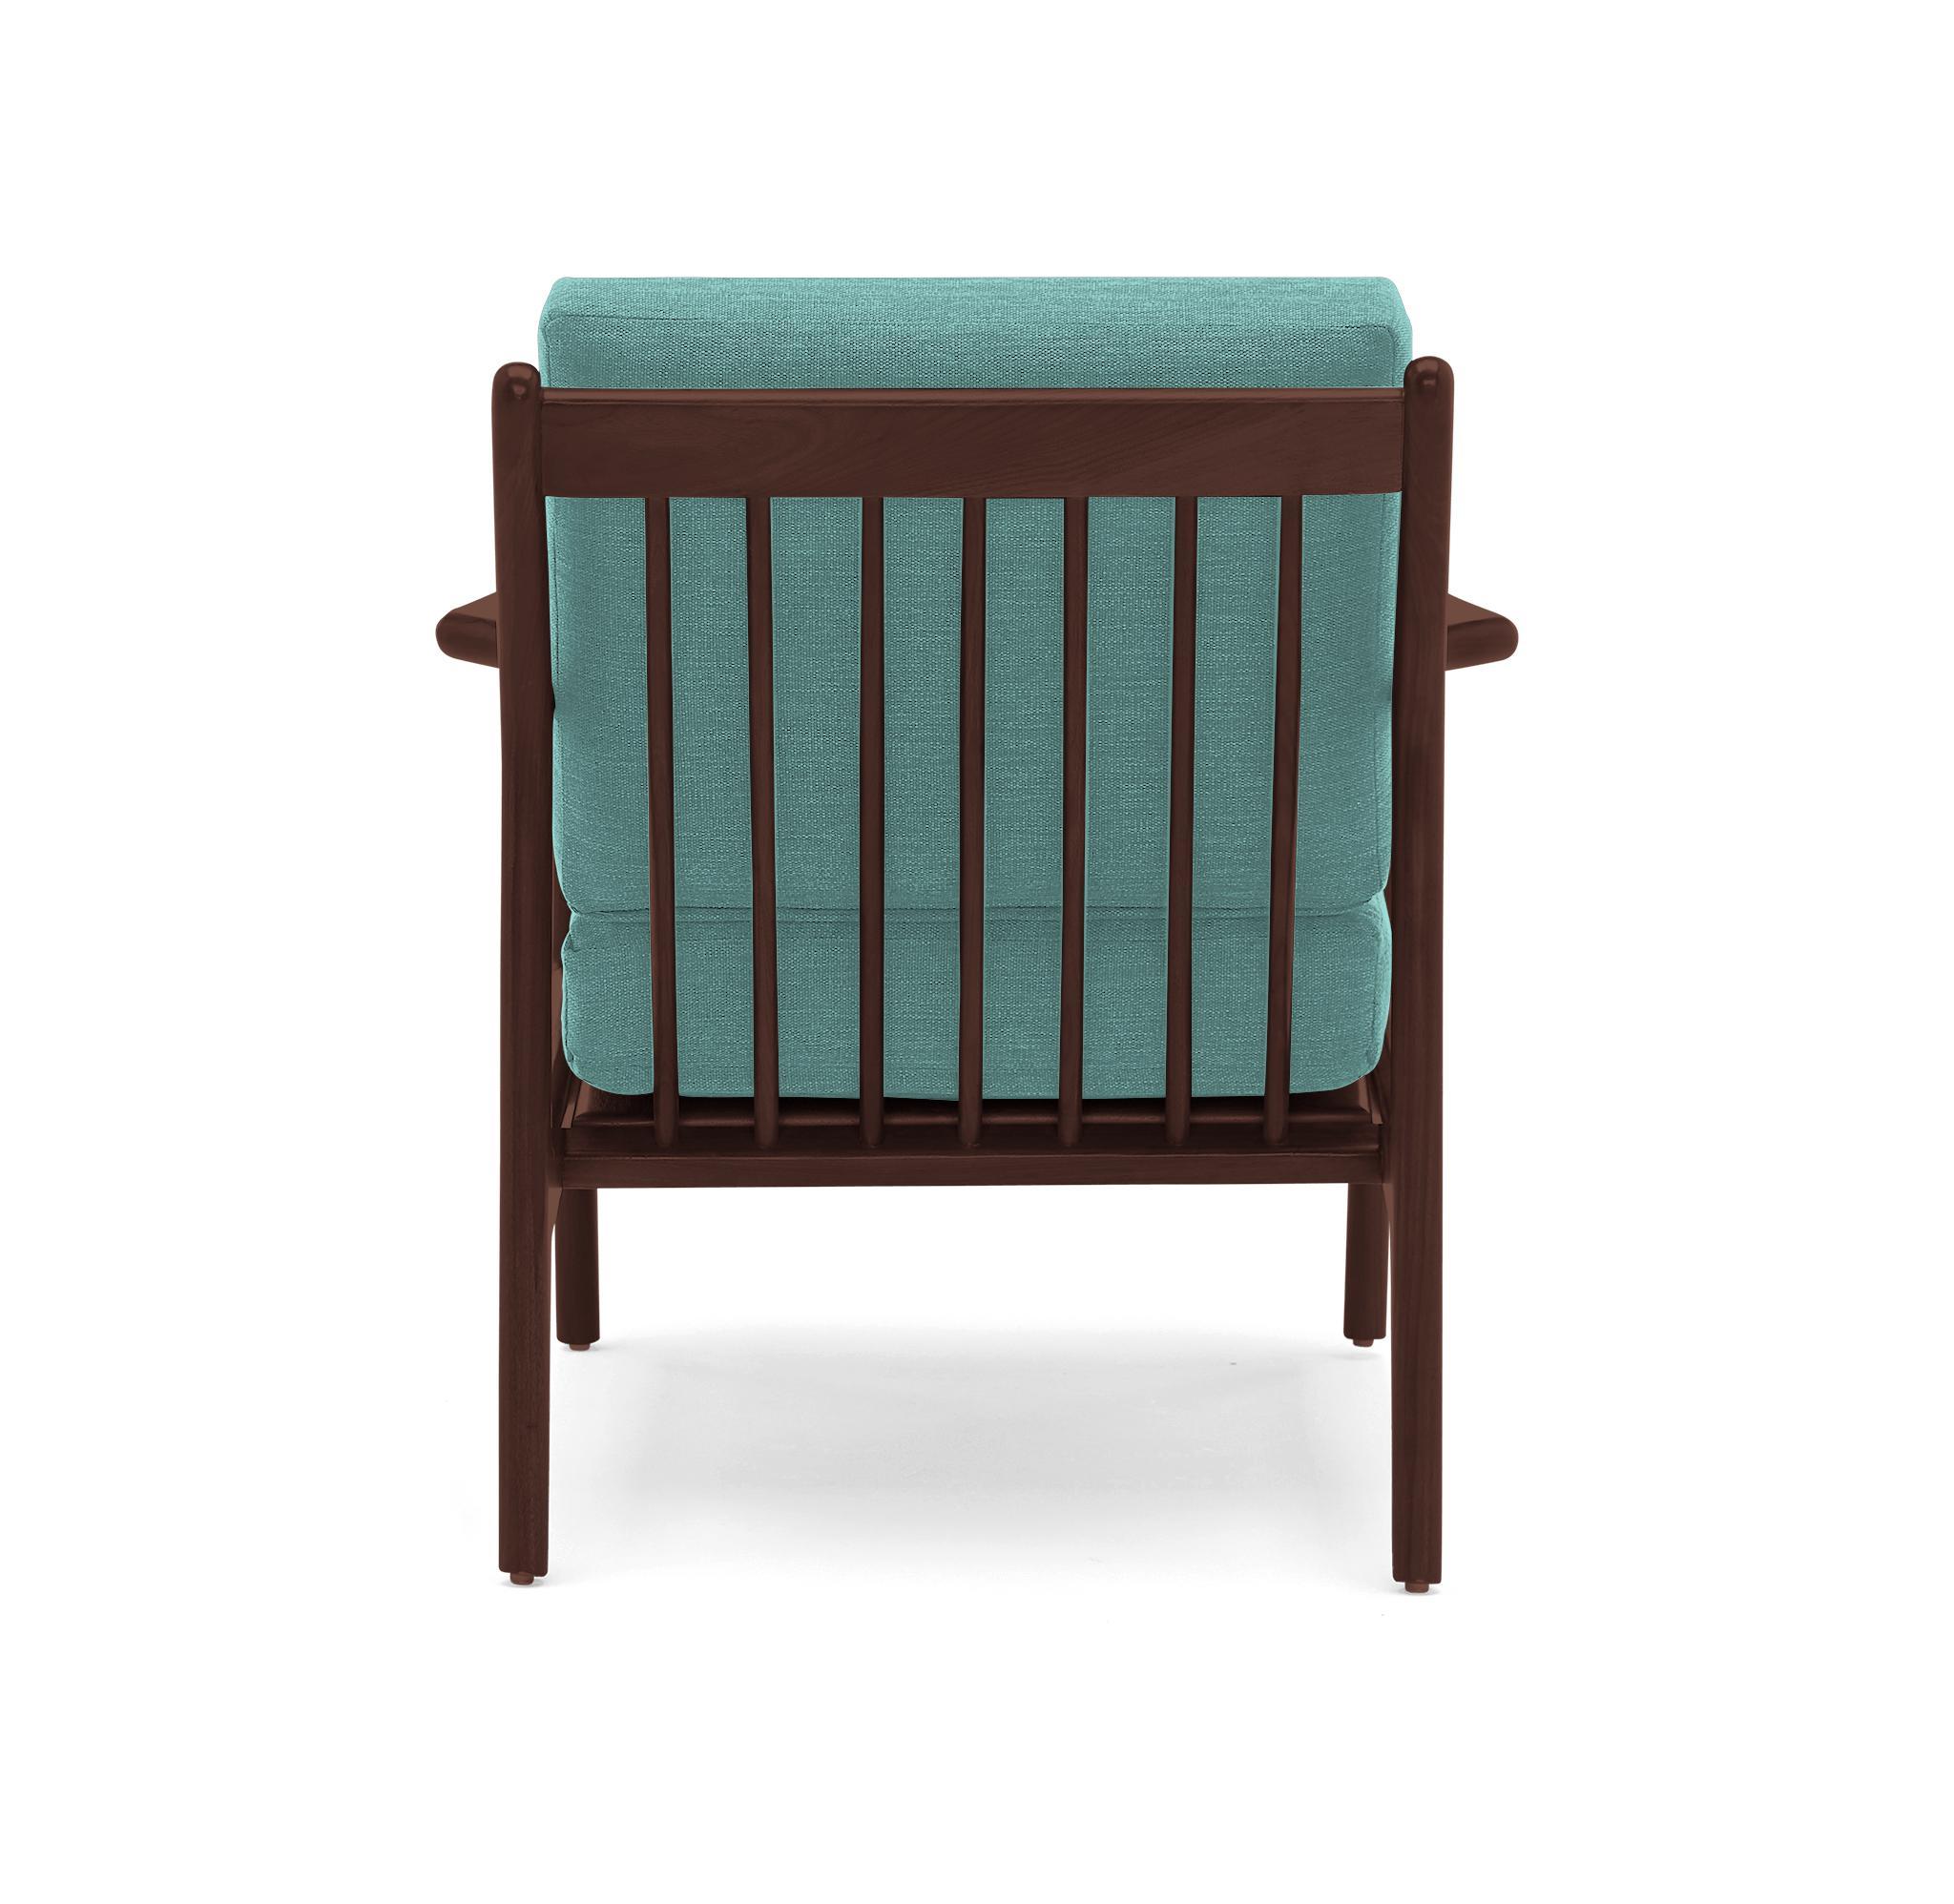 Green Collins Mid Century Modern Chair - Essence Aqua - Walnut